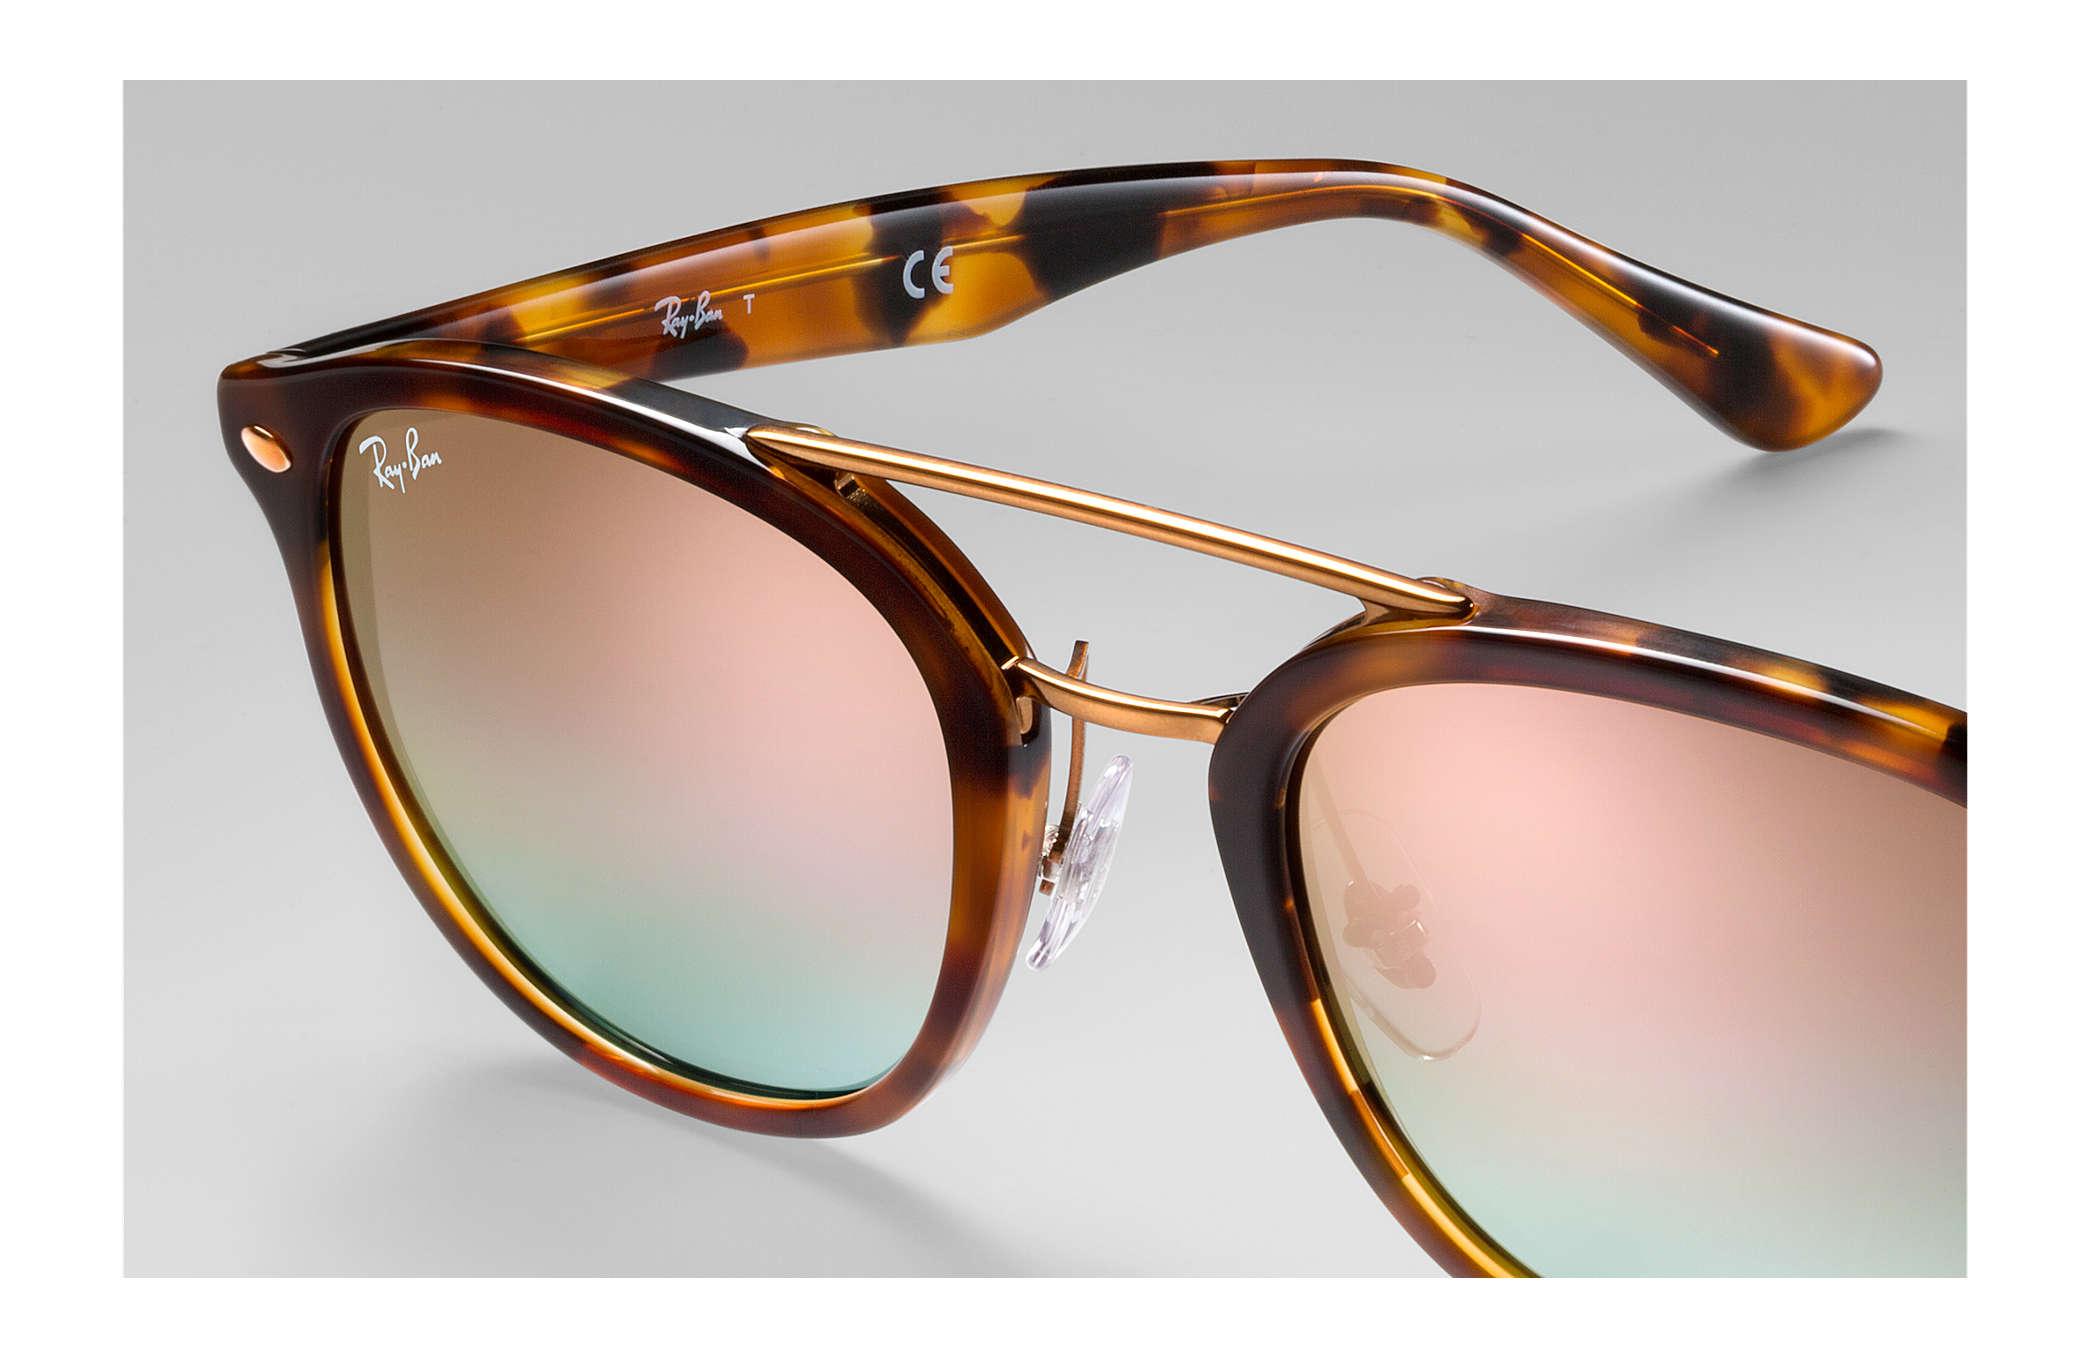 0e830ed5430 Ray-Ban RB2183 Tortoise - Acetate - Pink Lenses - 0RB21831127B953 ...